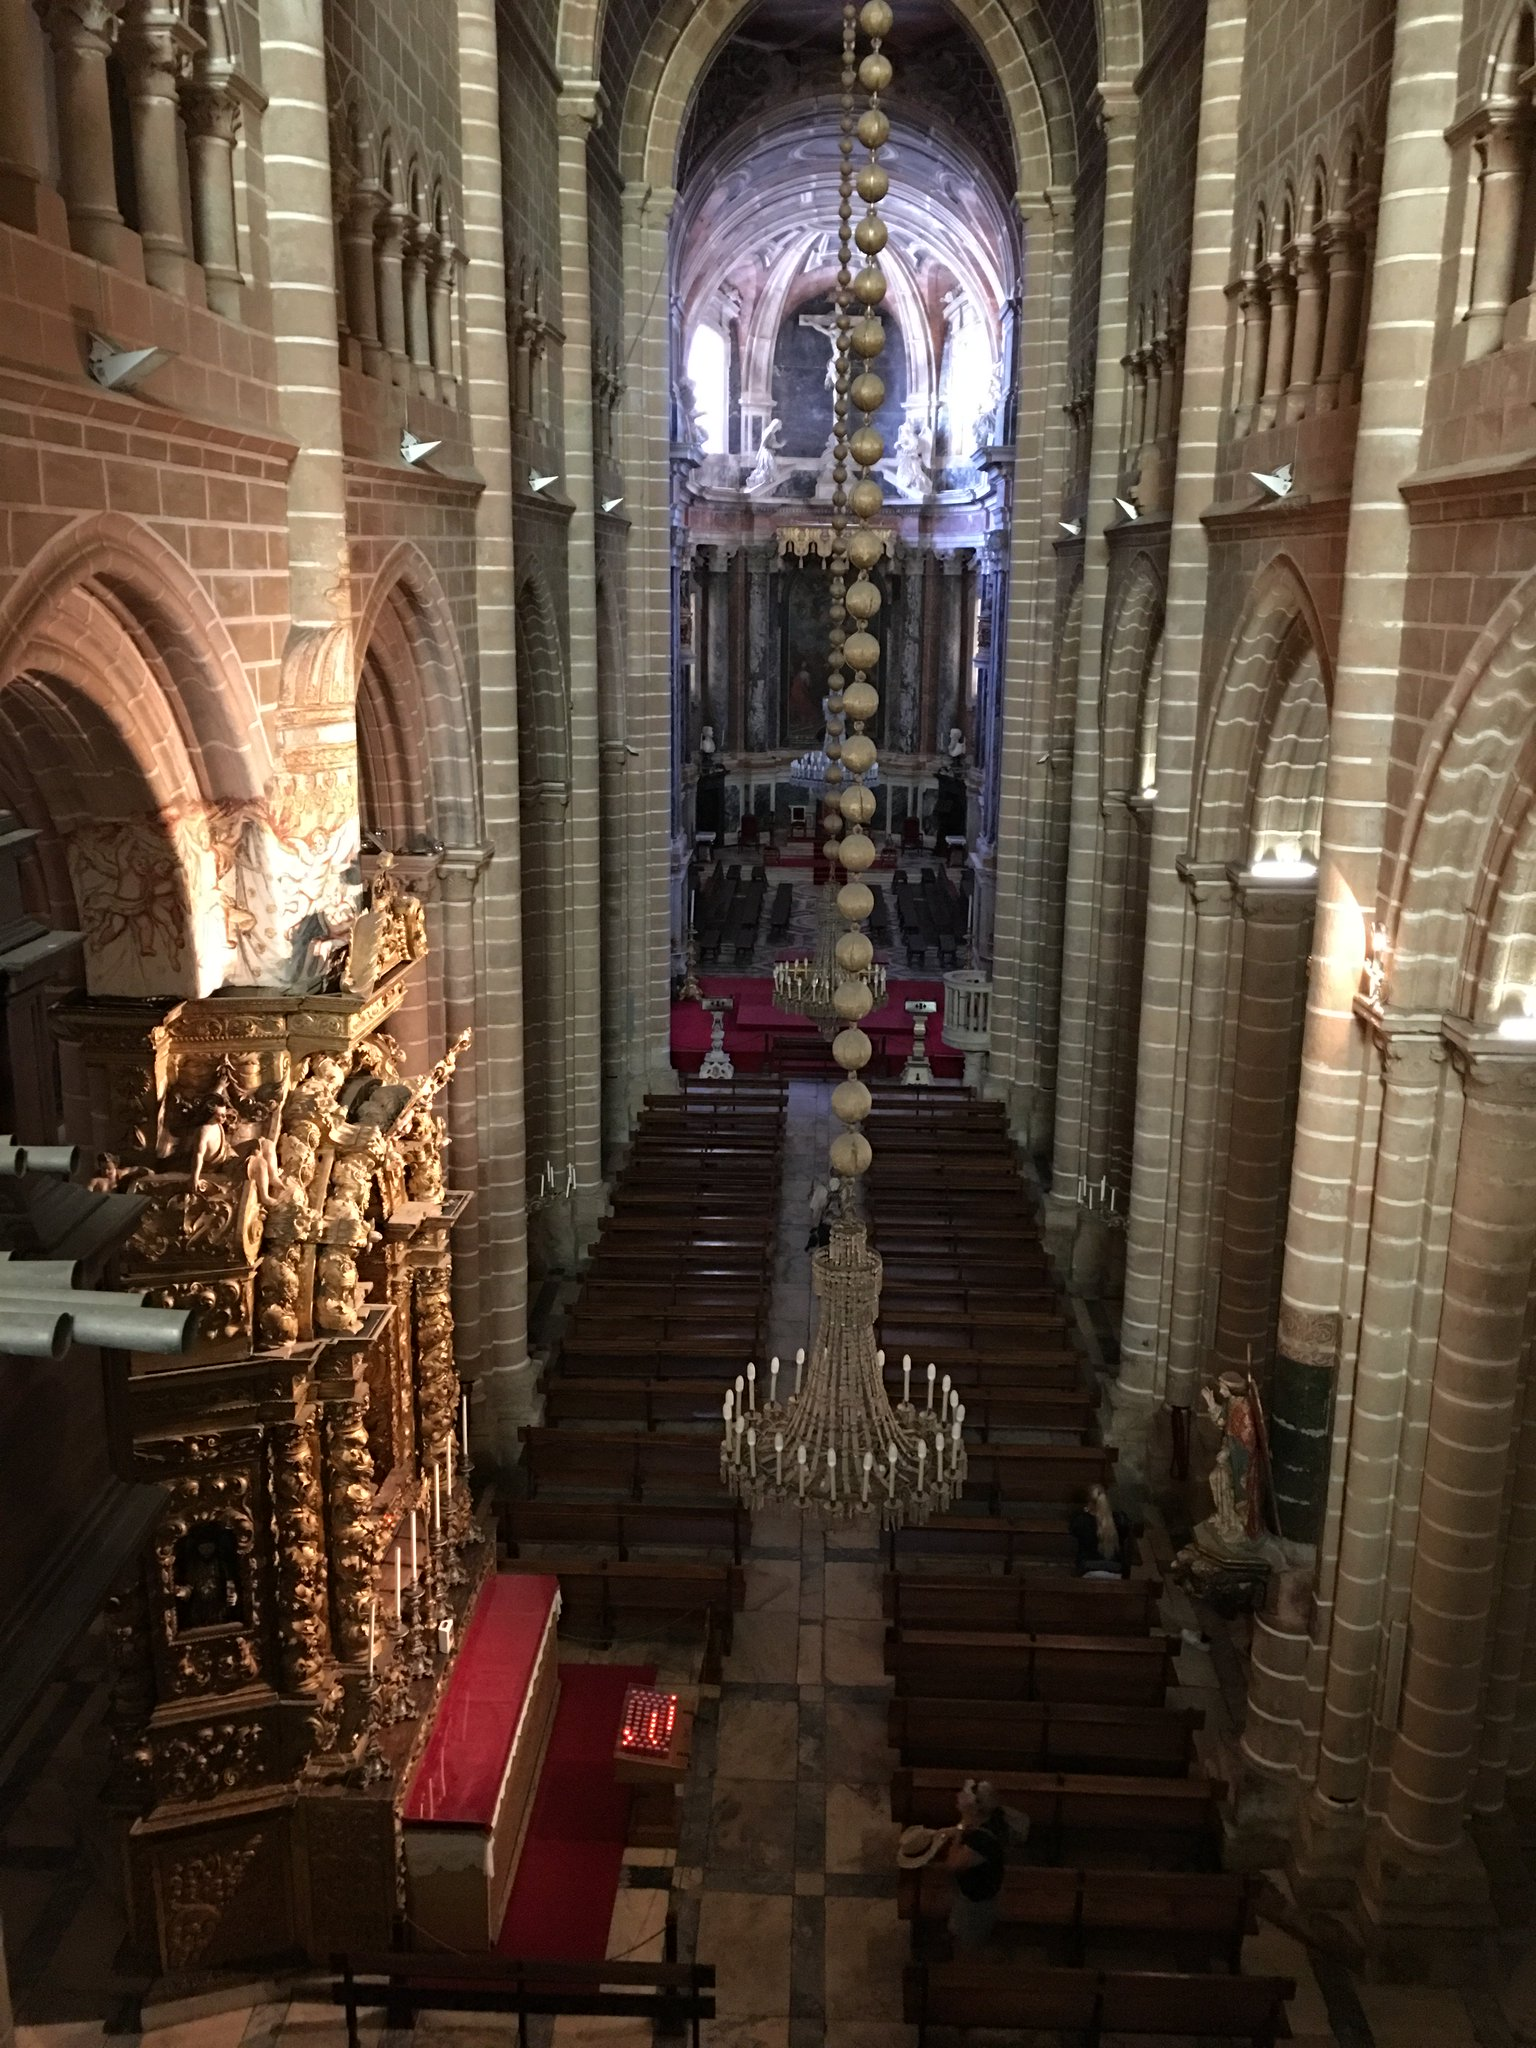 Blick in die Kirche. Ansonsten herrscht Fotoverbot #olimarreisen #meurers https://t.co/nIdTb4CaAz